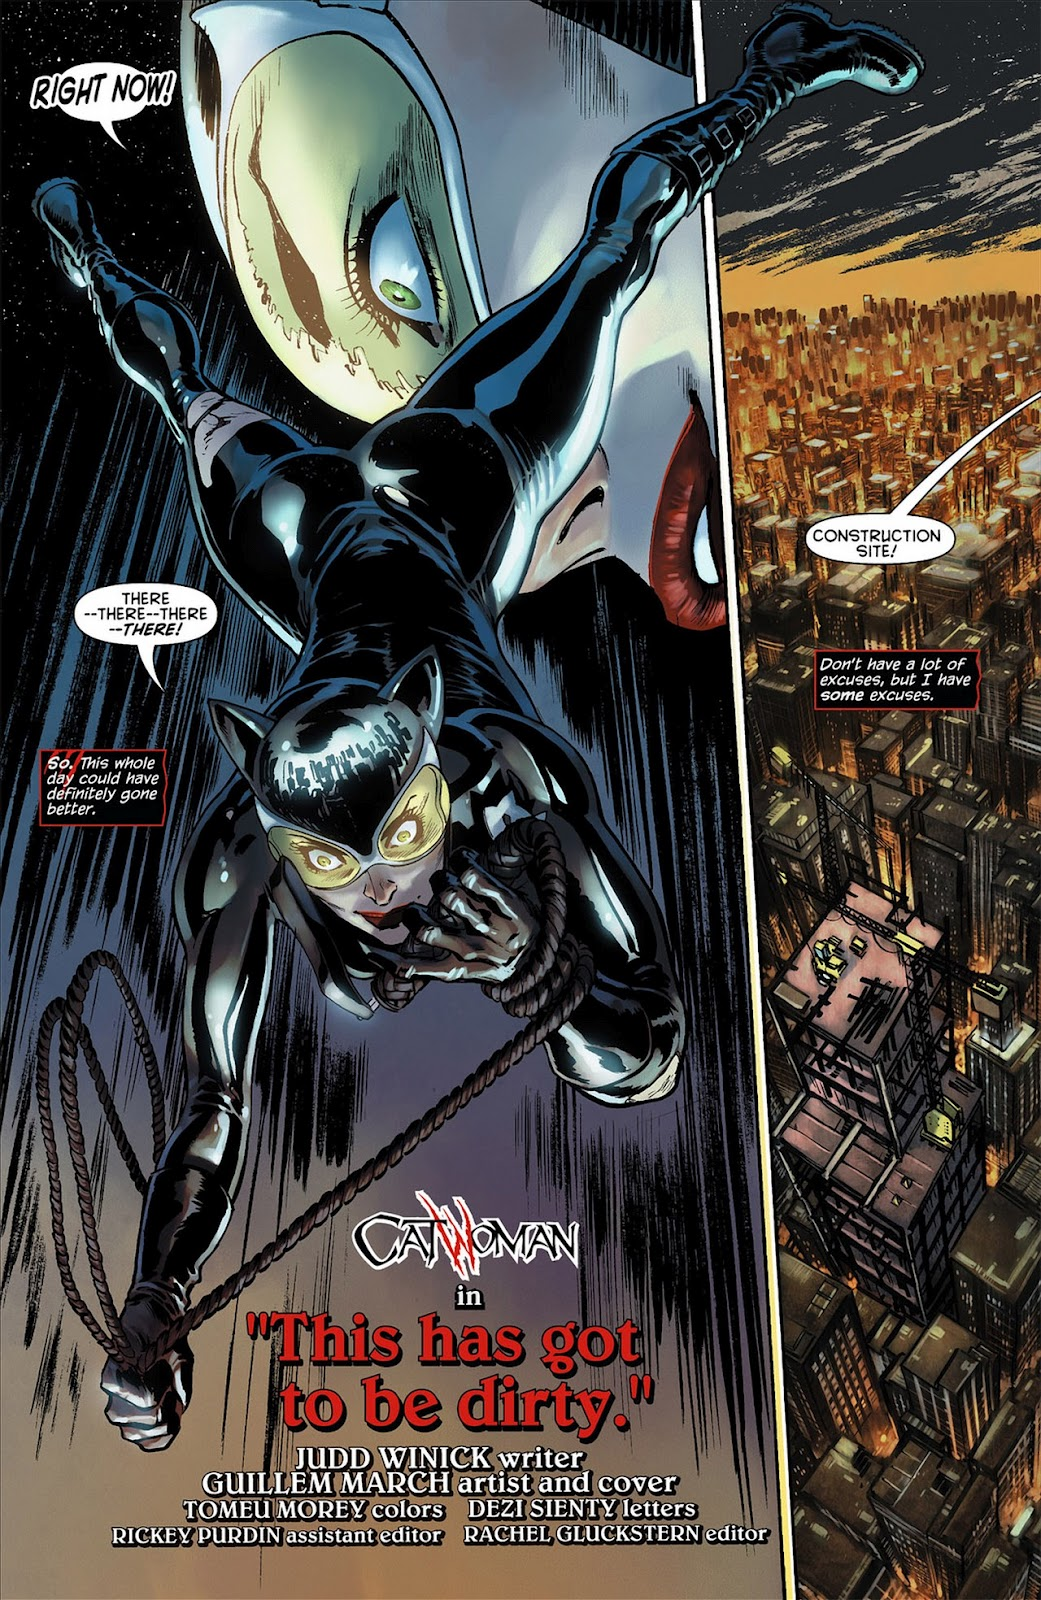 52 Photos 37 Reviews: New 52 Catwoman Wallpaper